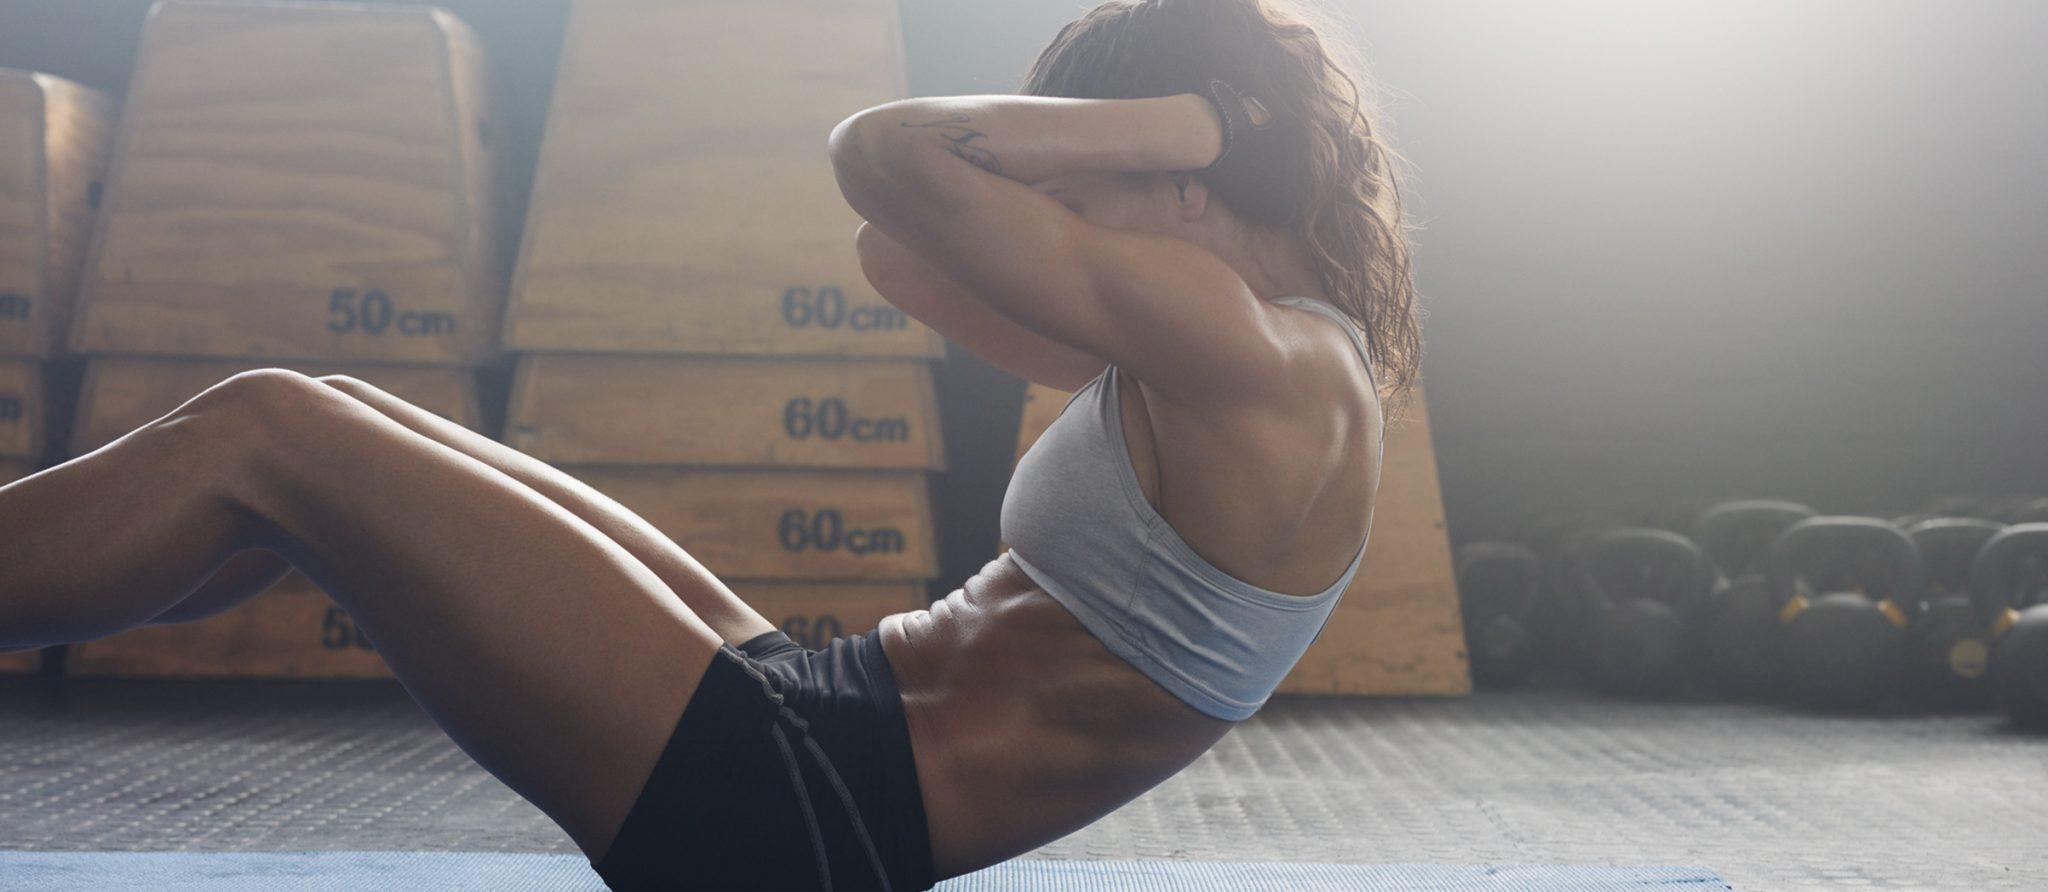 start-program-gimnasio-economico-fitness-sabadell-piscina-entrenador-natacion-boxeo-pilates-yoga